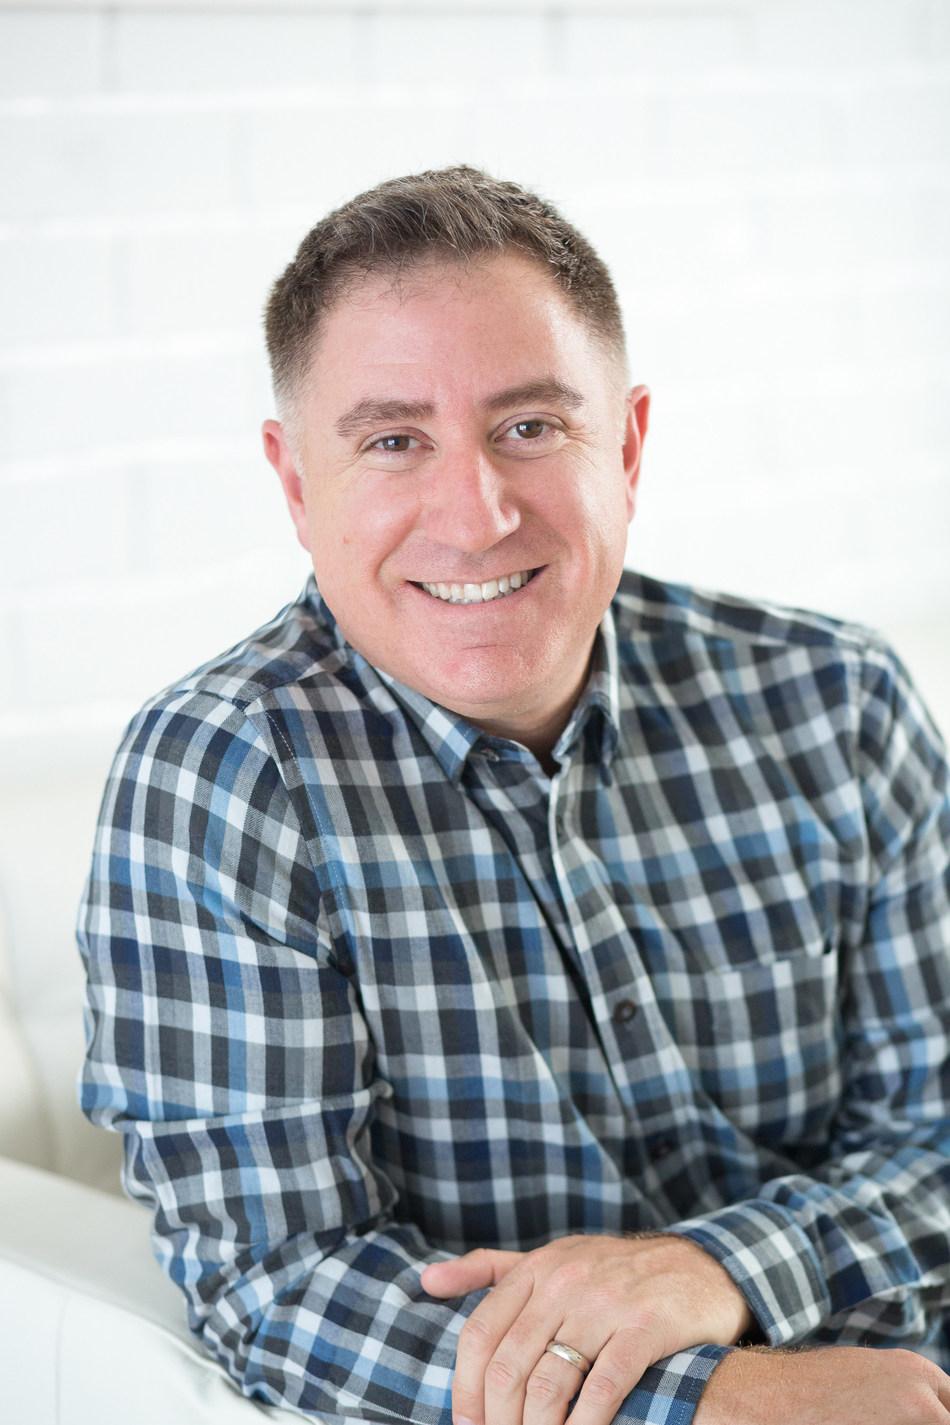 Javier O. Ruiz, Carzato CEO & Co-Founder